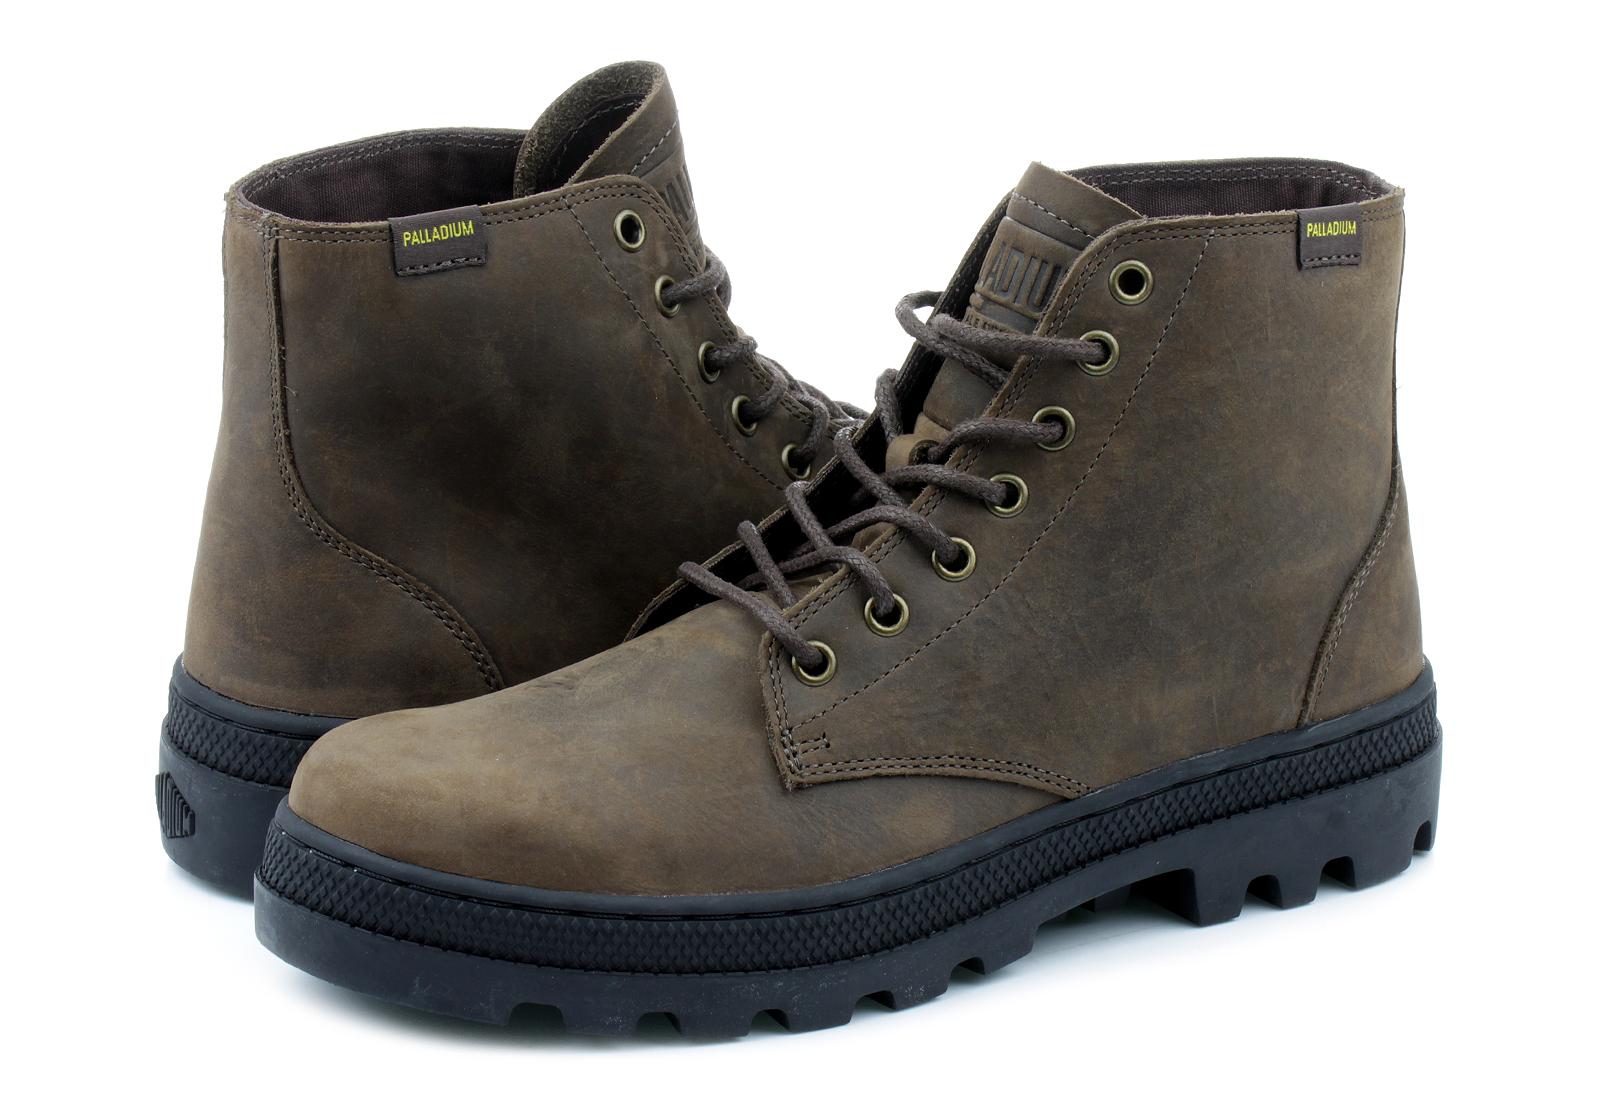 Palladium Shoe Sizes